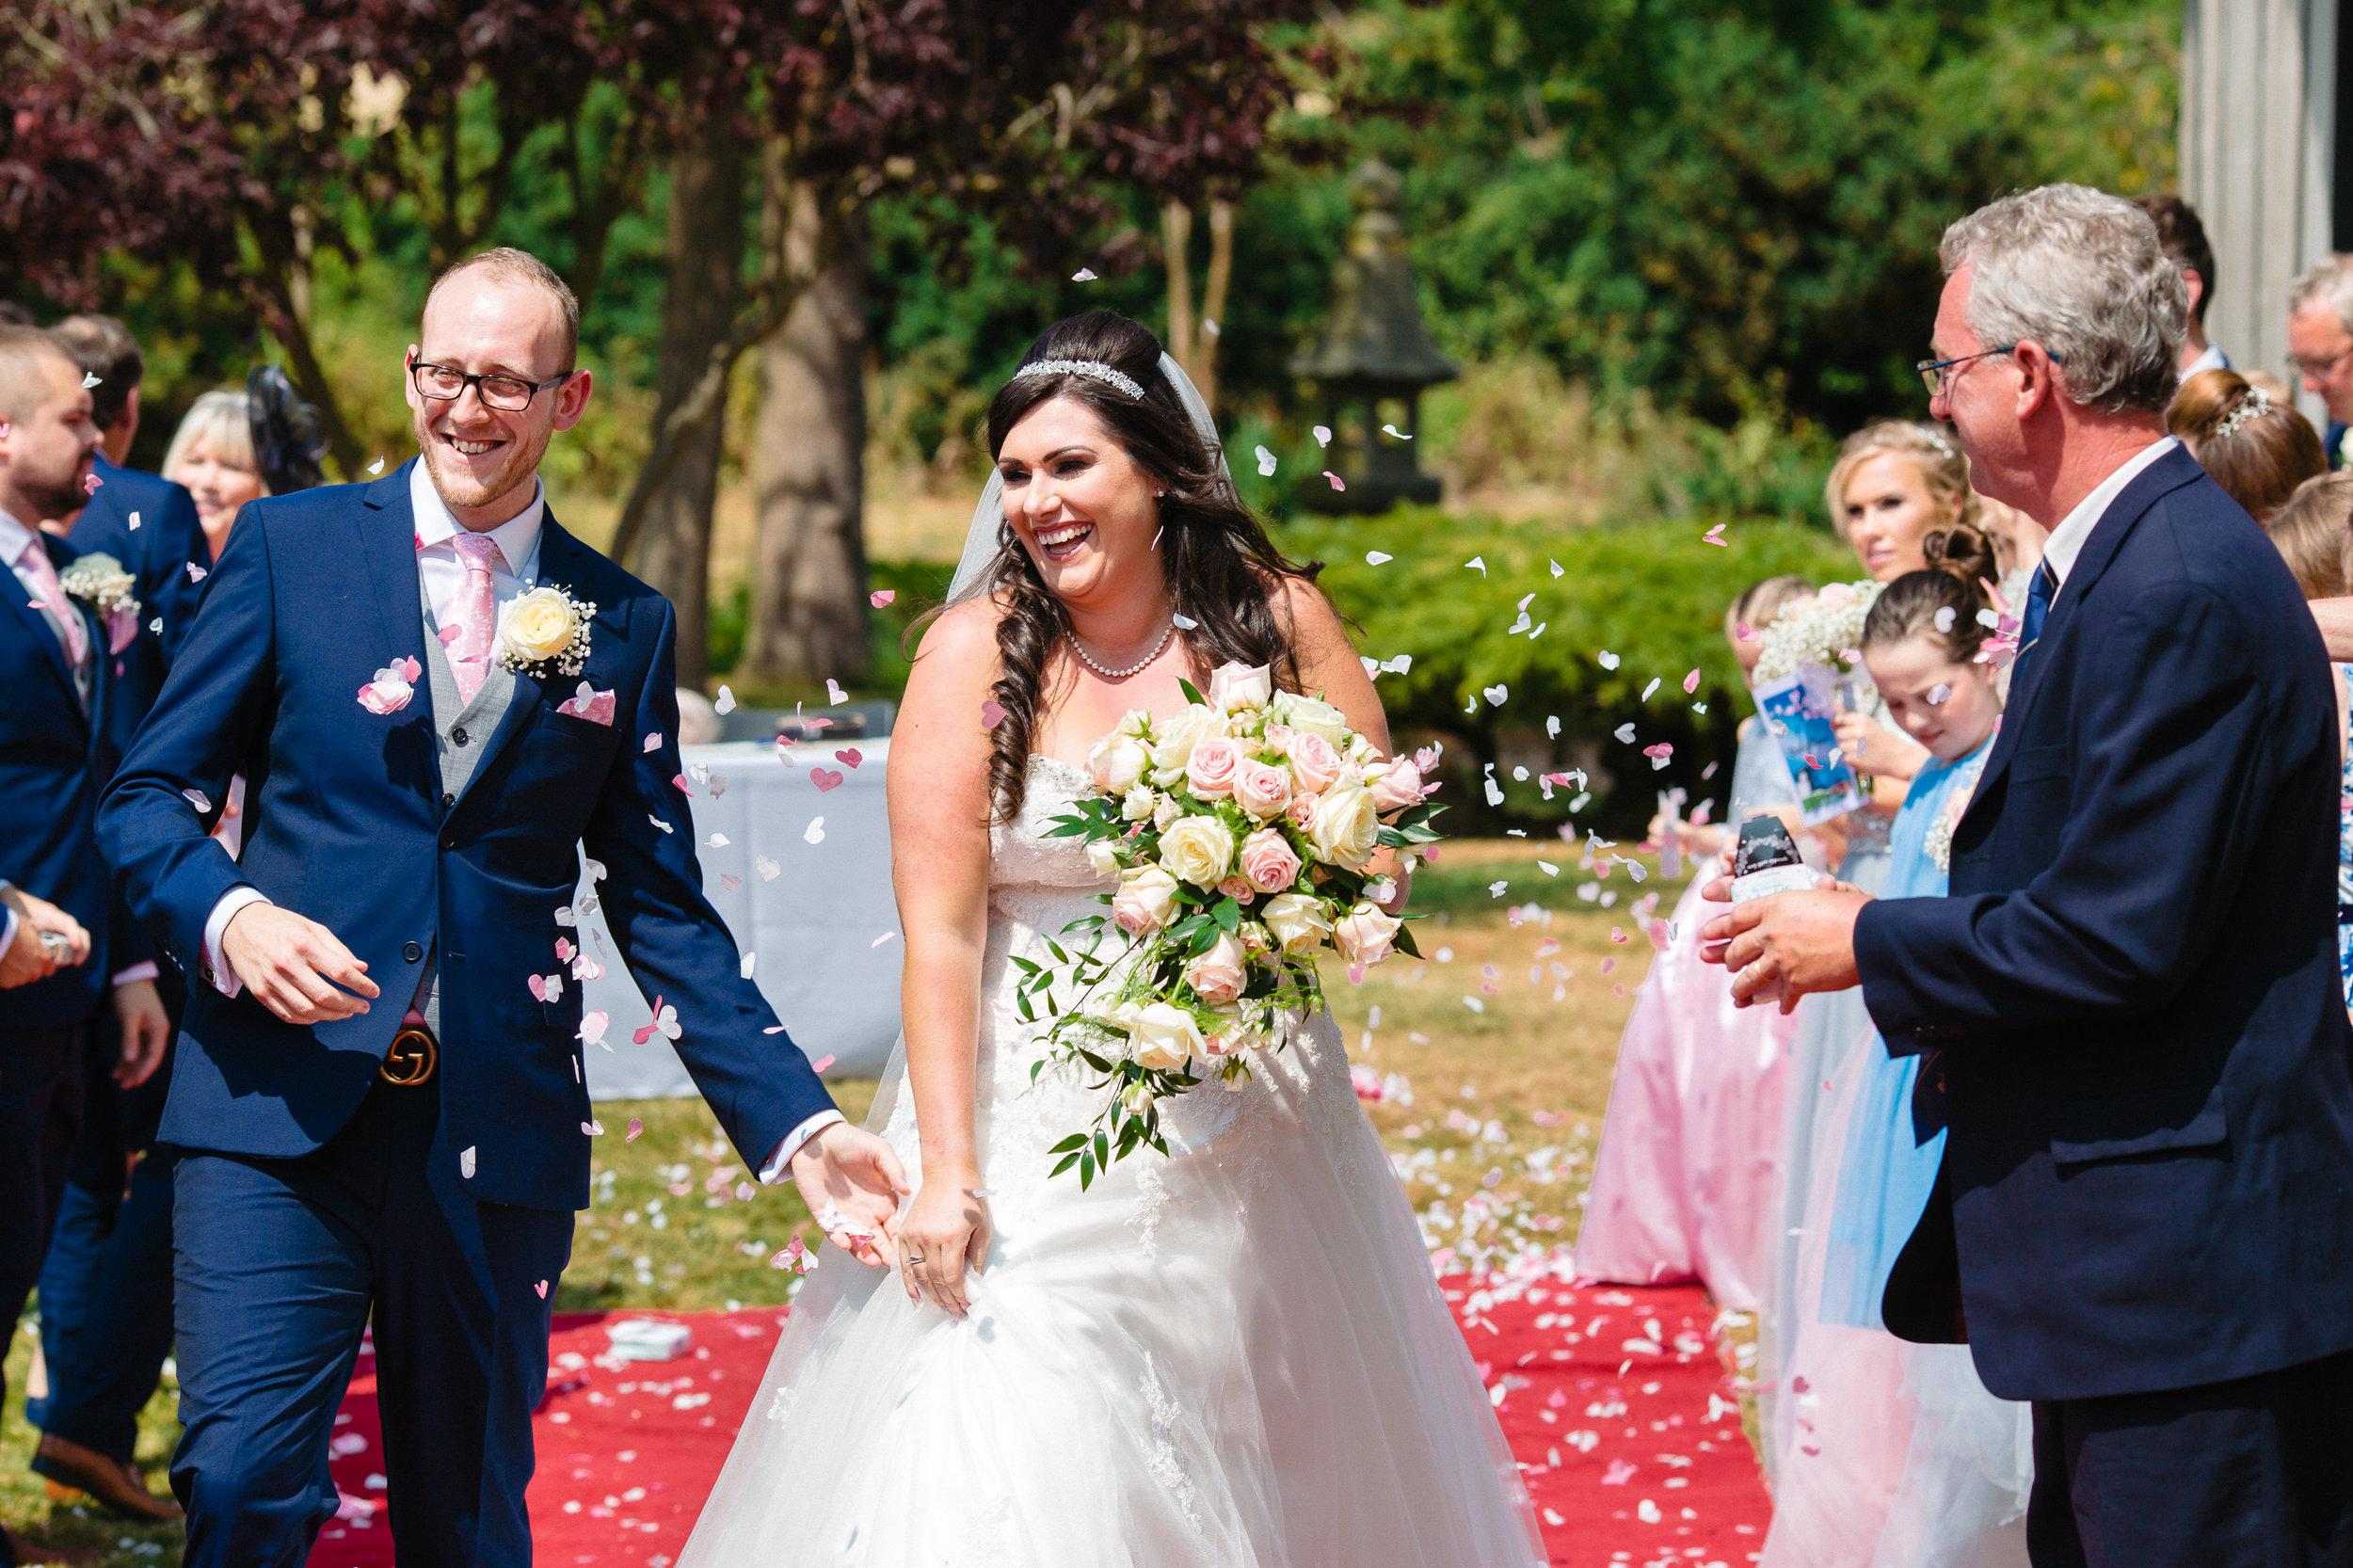 lucy-richard-wedding-268.jpg